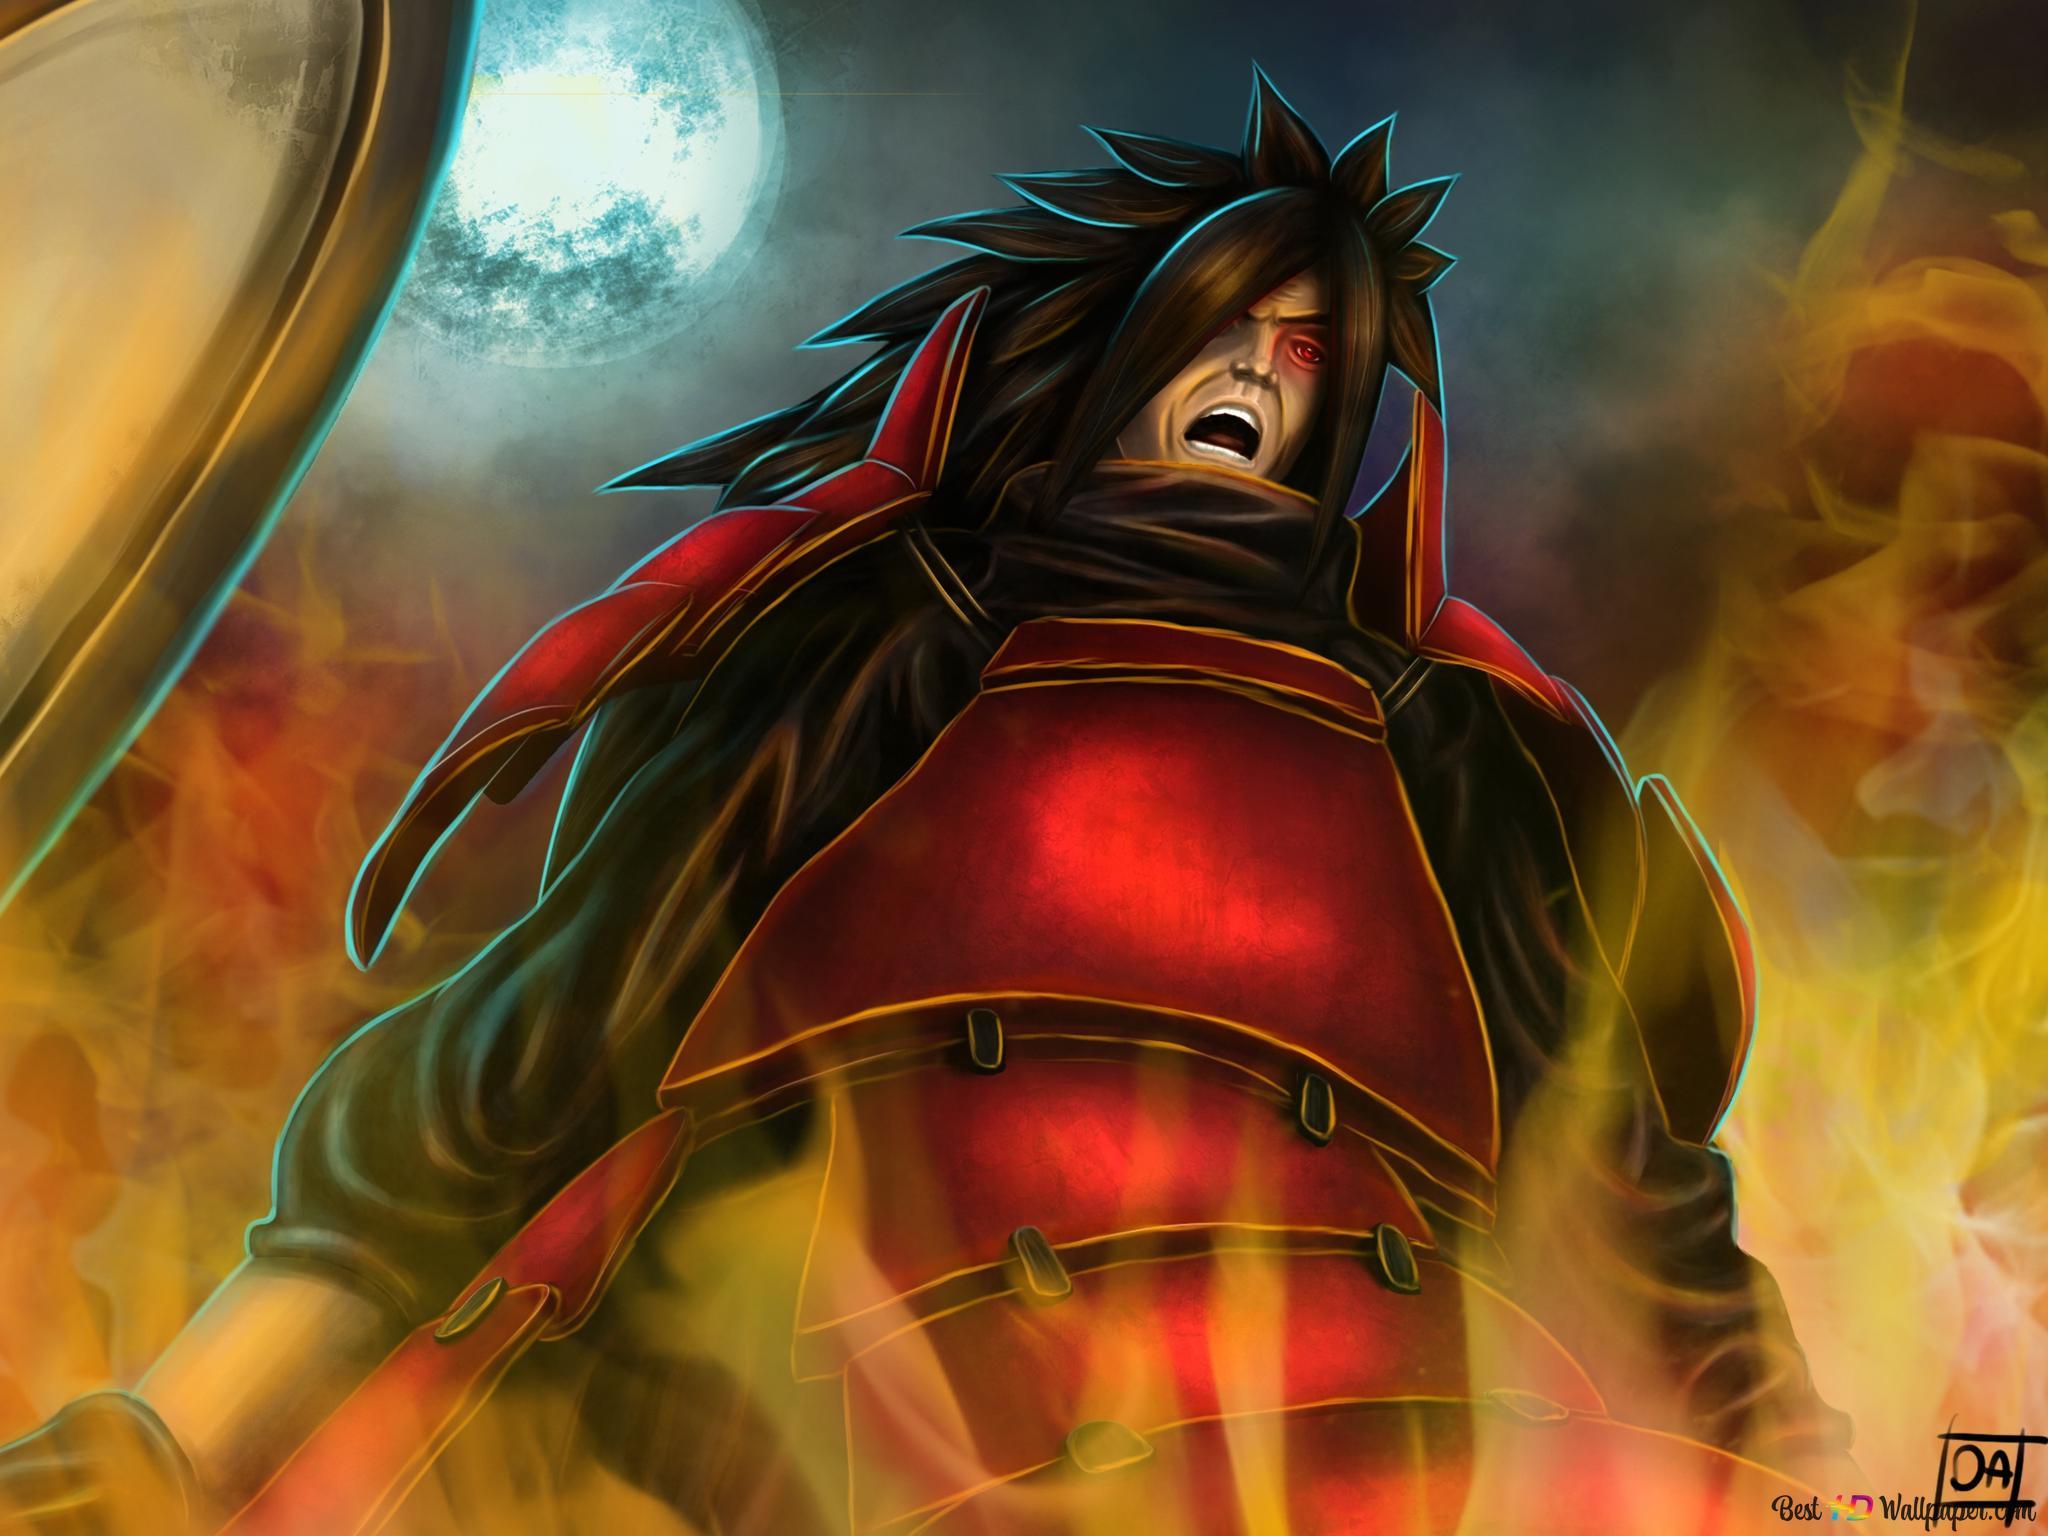 Naruto Shippuden Madara Uchiha Pemimpin Legendaris Dari Uchiha Clan Unduhan Wallpaper Hd